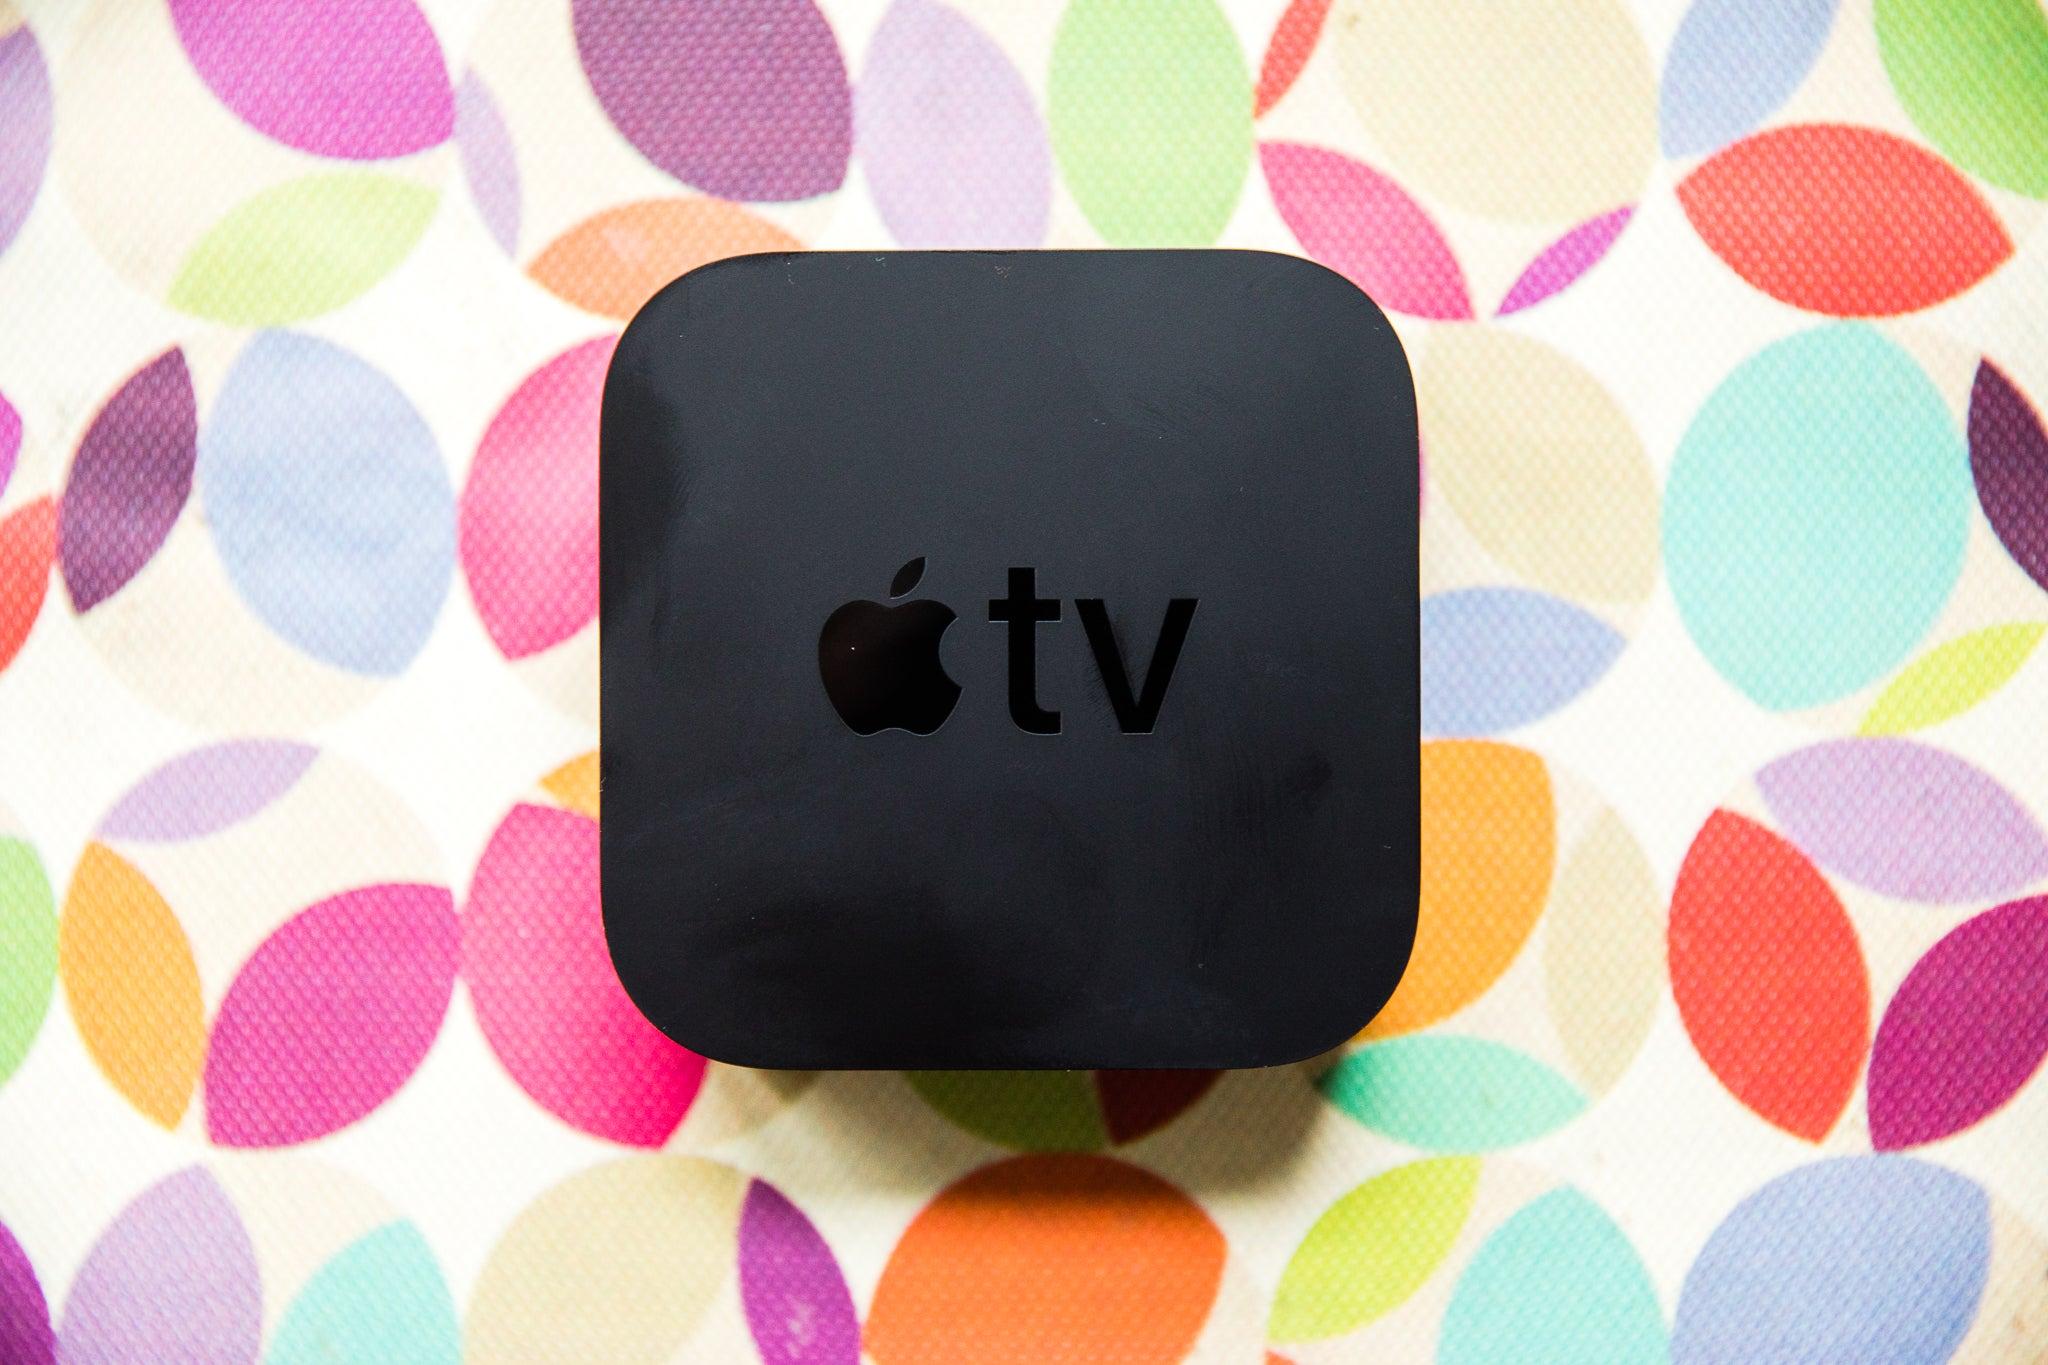 The Apple TV 4K